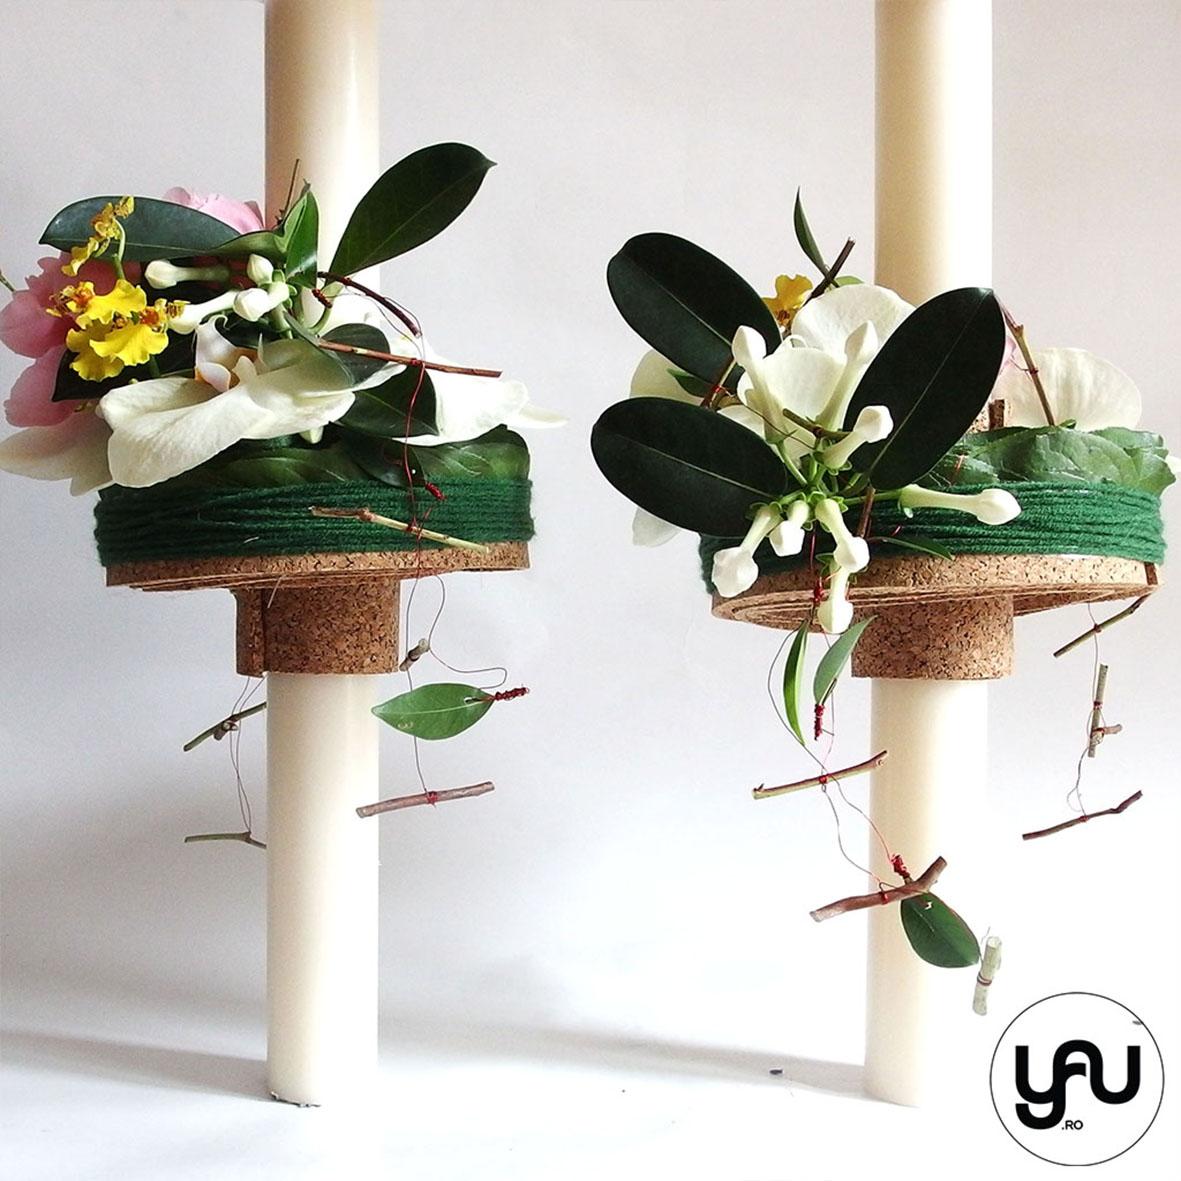 codrul-cu-flori-albe-bujori-mathiola-orhidee-_-yau-evenimente-2016-_-nunta-la-zexe-_-elenatoader-17